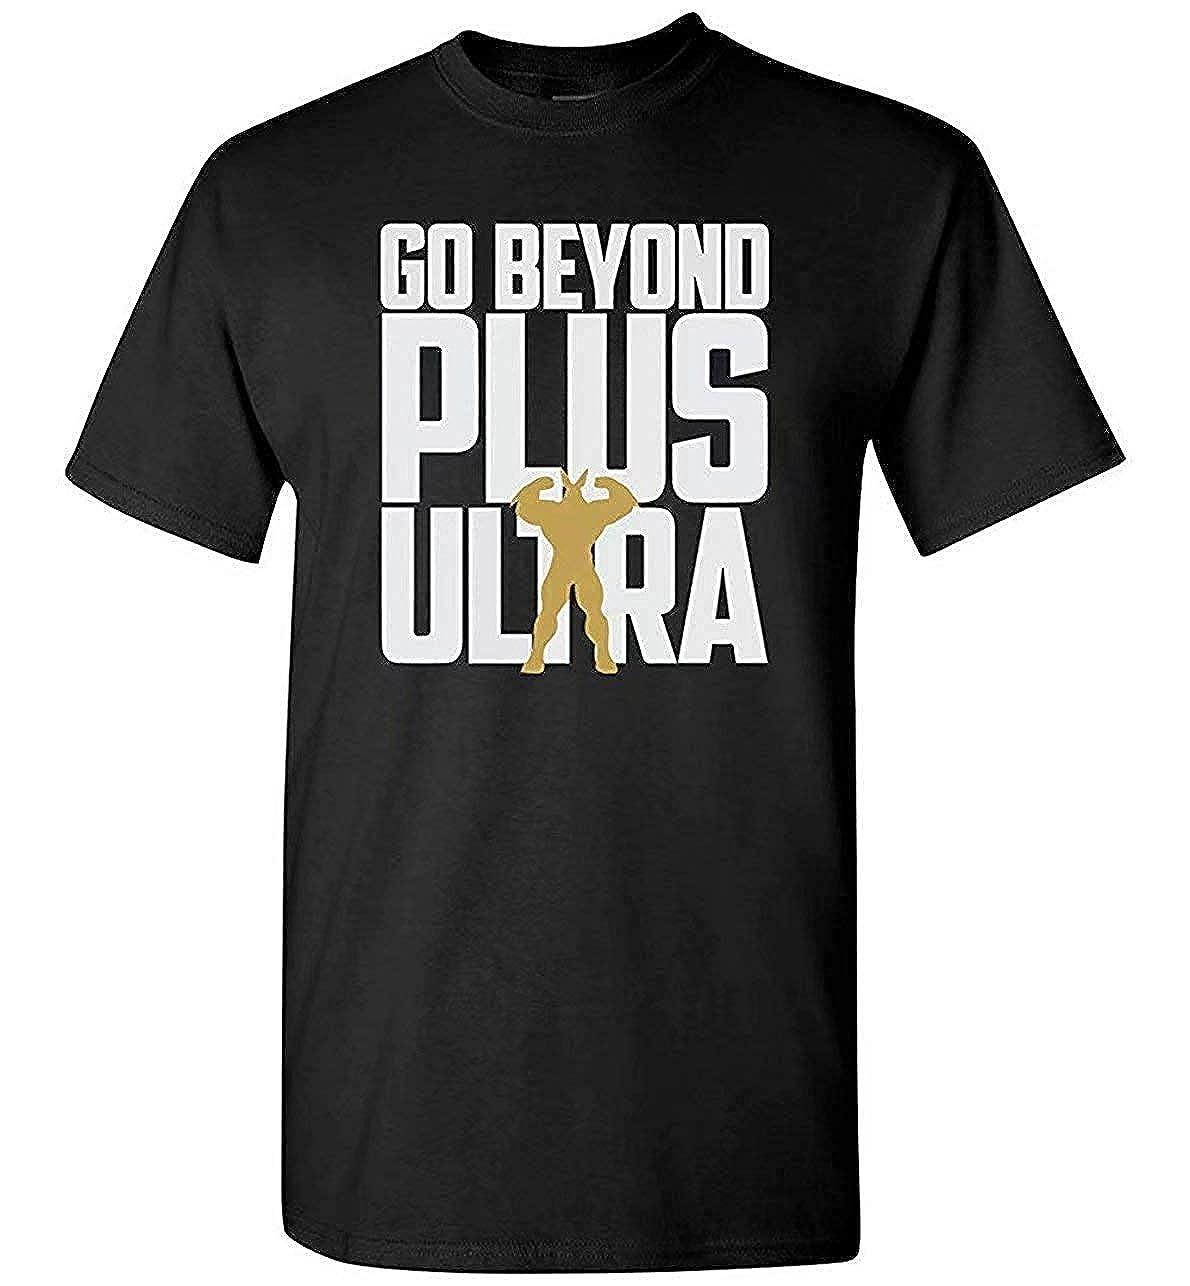 PEGGYNCO My Hero Academia Shirt Go Beyond Plus Ultra Tee Mens//Unisex